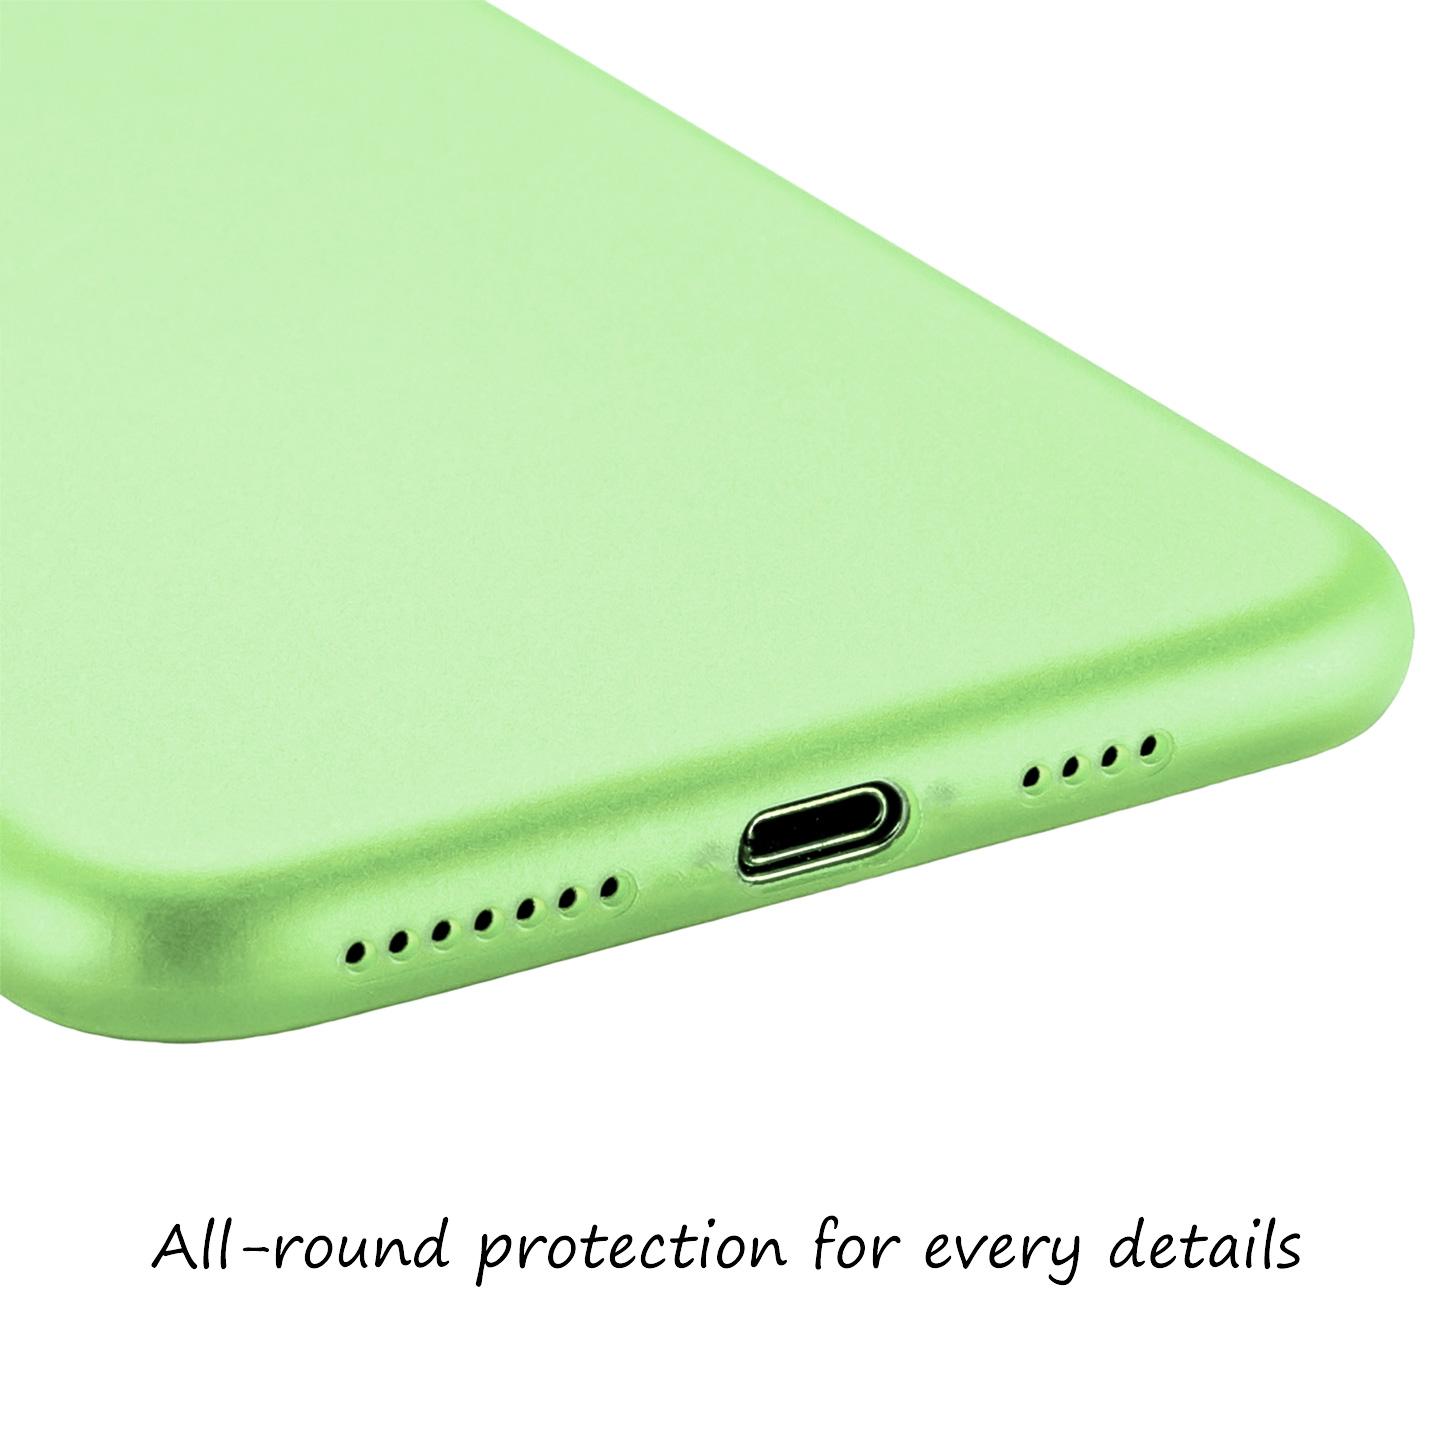 Ultra-Slim-Case-iPhone-11-Pro-5-8-034-Matt-Clear-Schutz-Huelle-Skin-Cover-Etui-Folie Indexbild 32